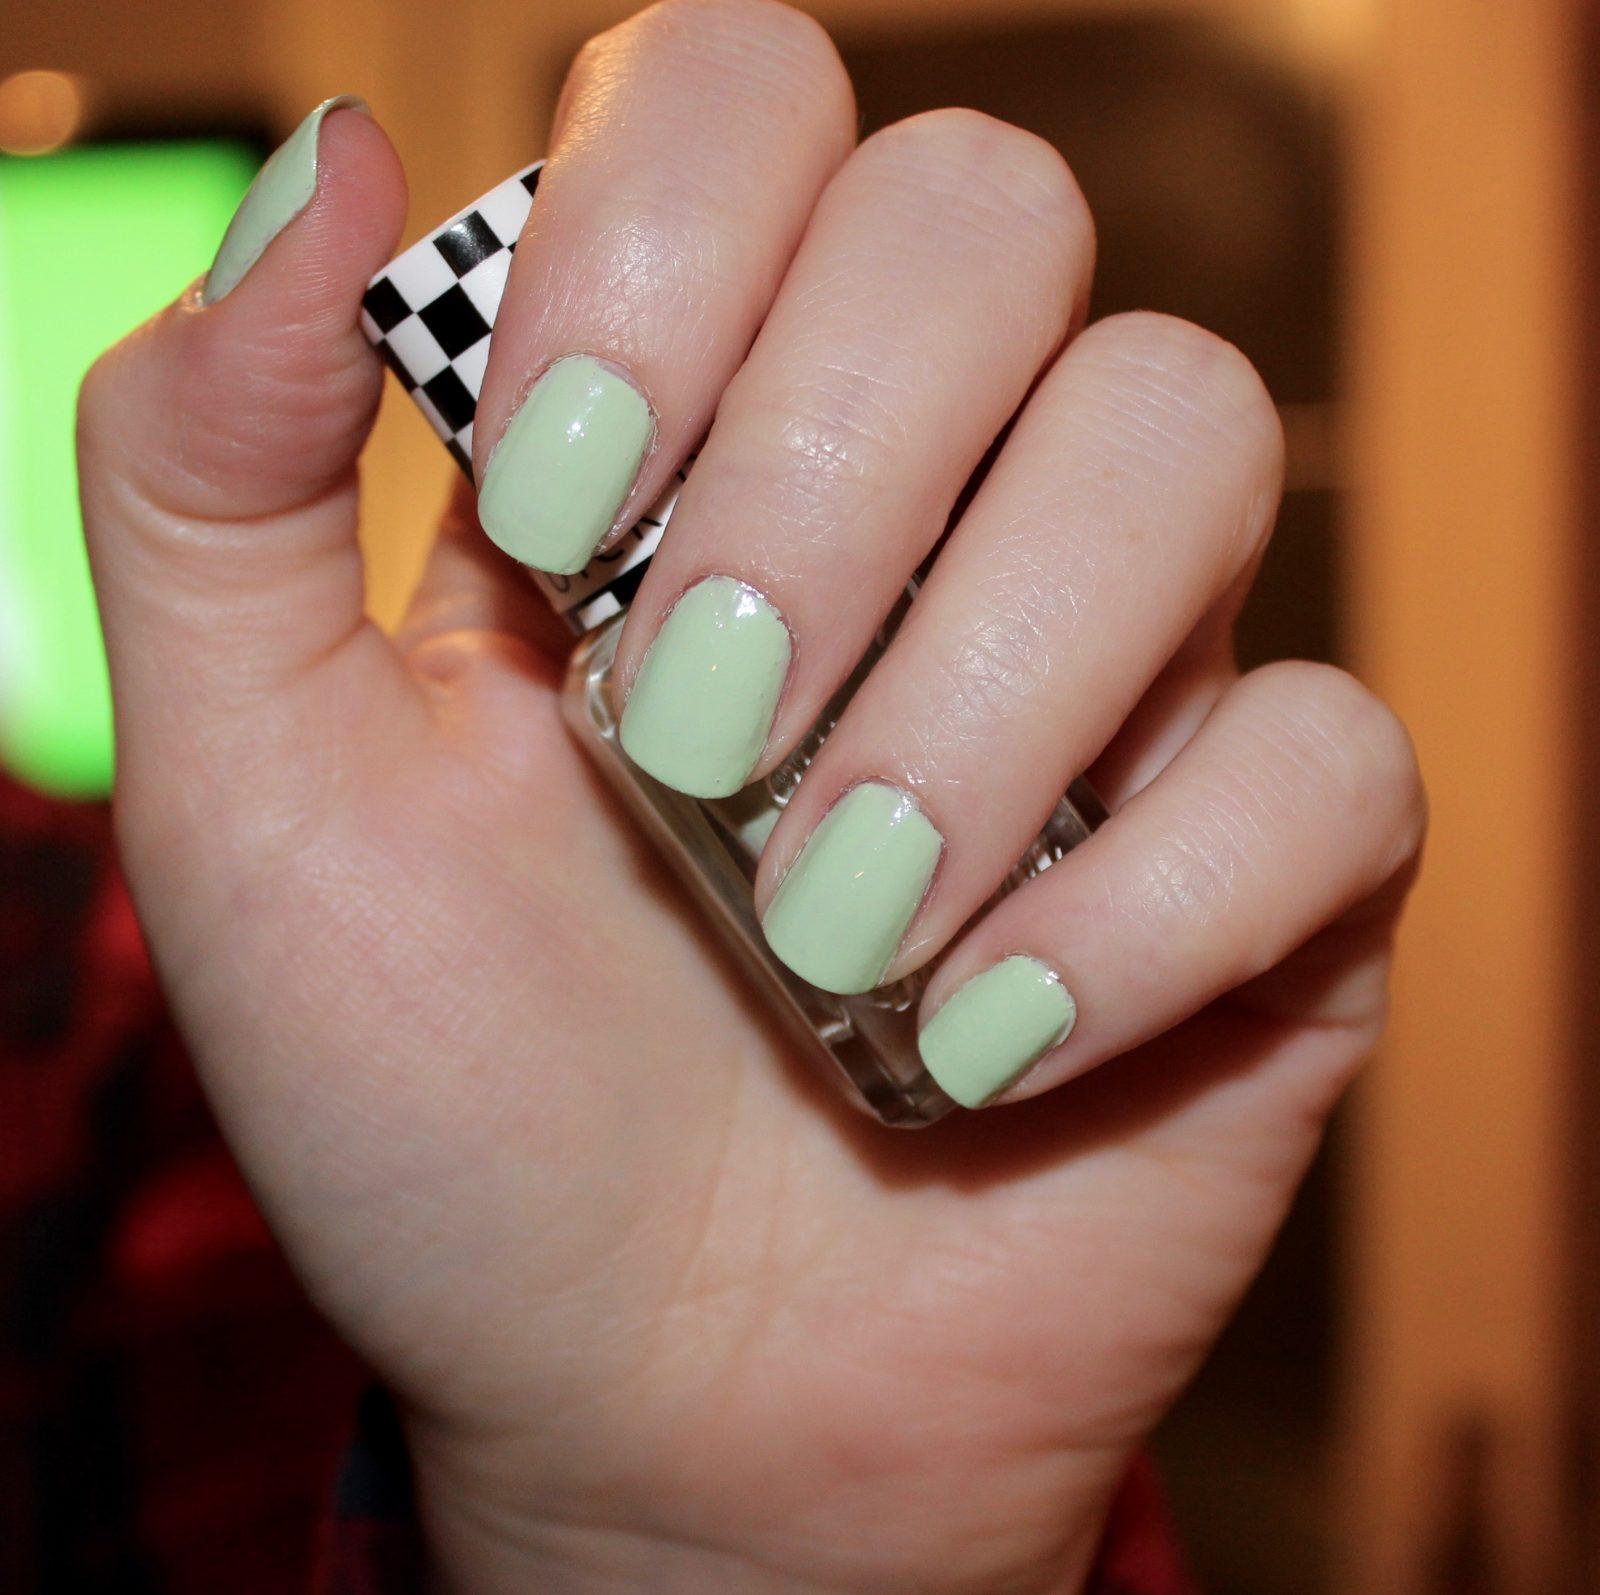 How Long To Let Nail Polish Dry Before Top Coat: Irish Beauty Blog Beautynook